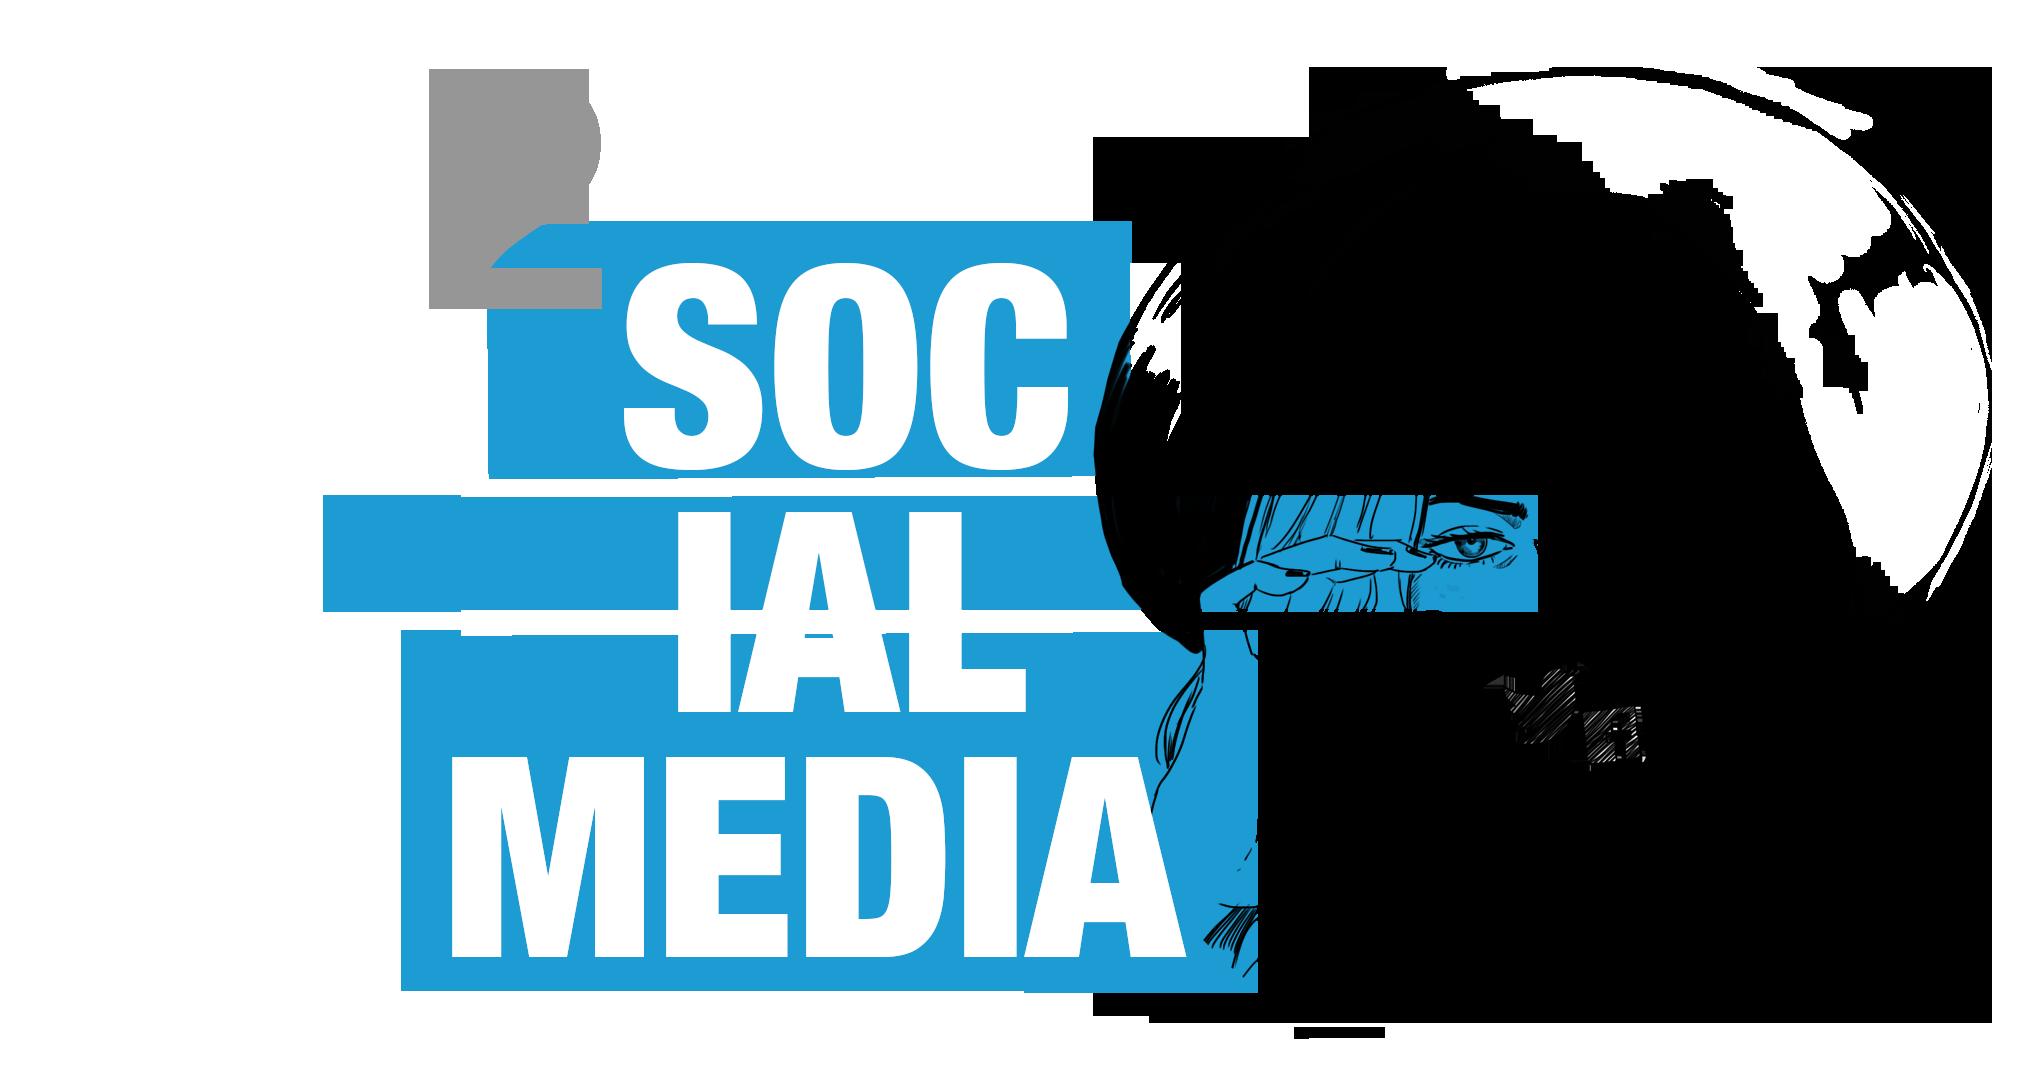 servicio social media agencia bigbox